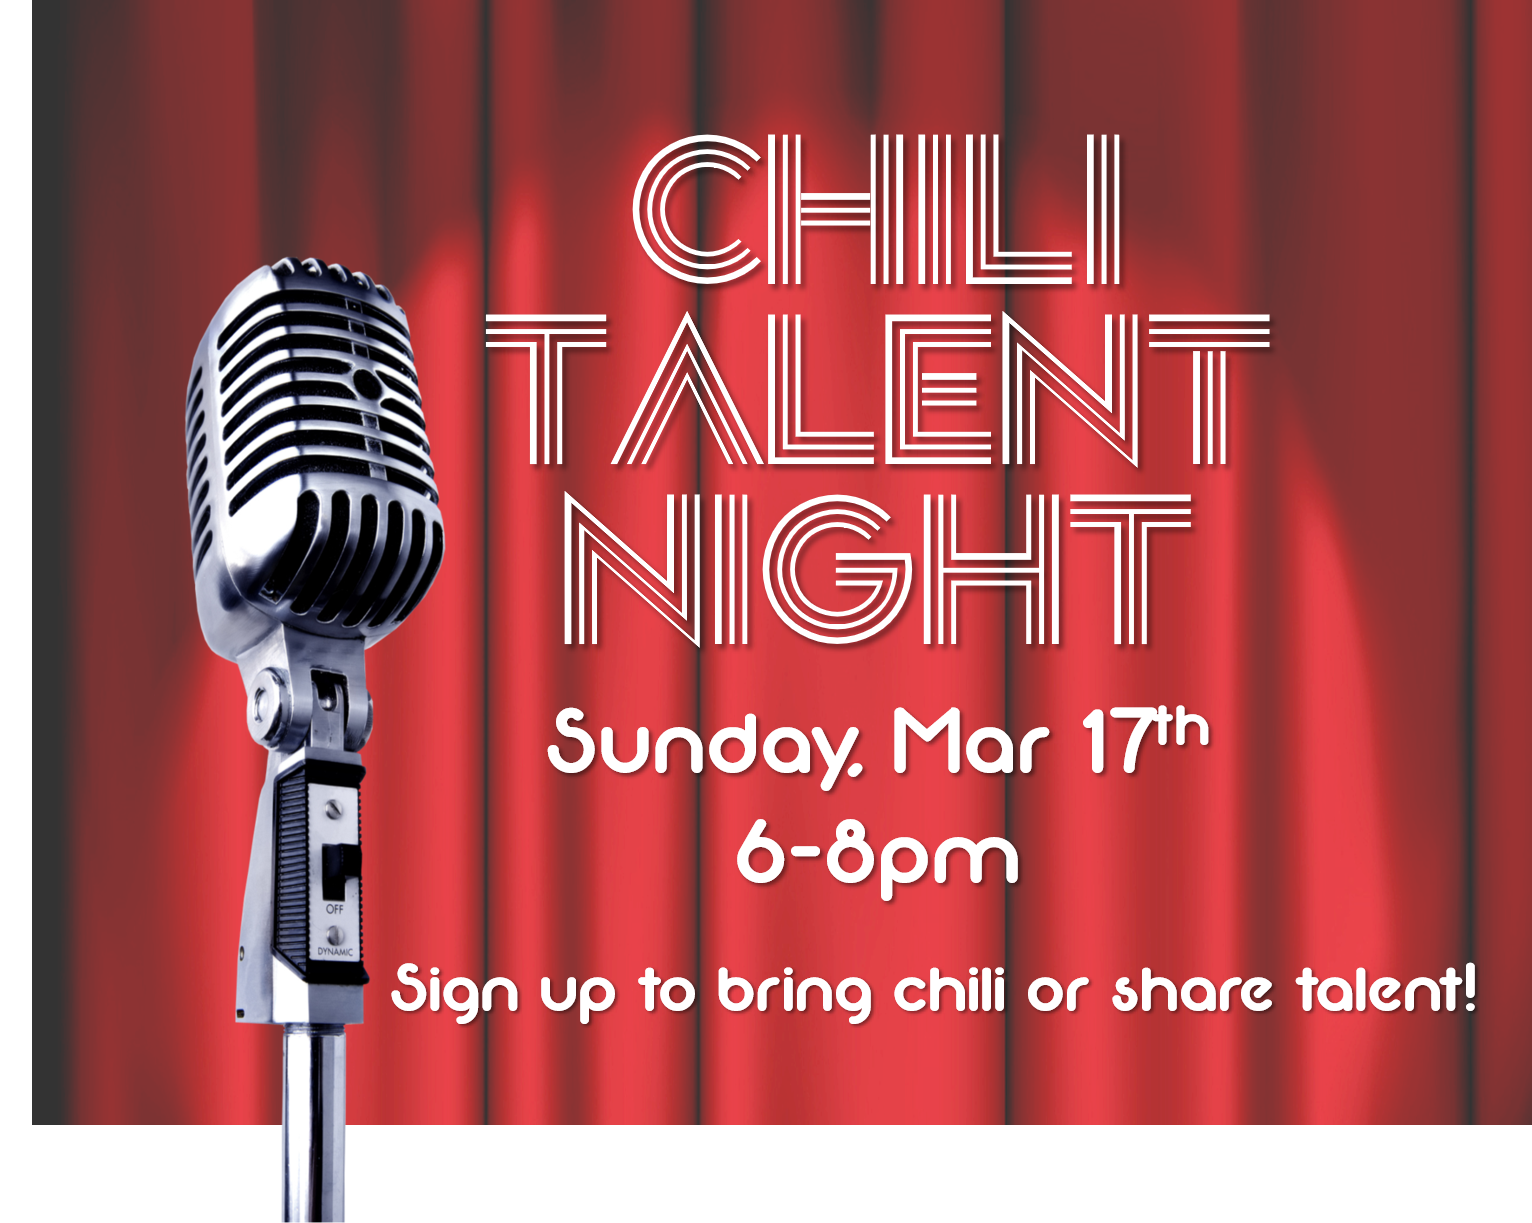 chili talent night pic.png